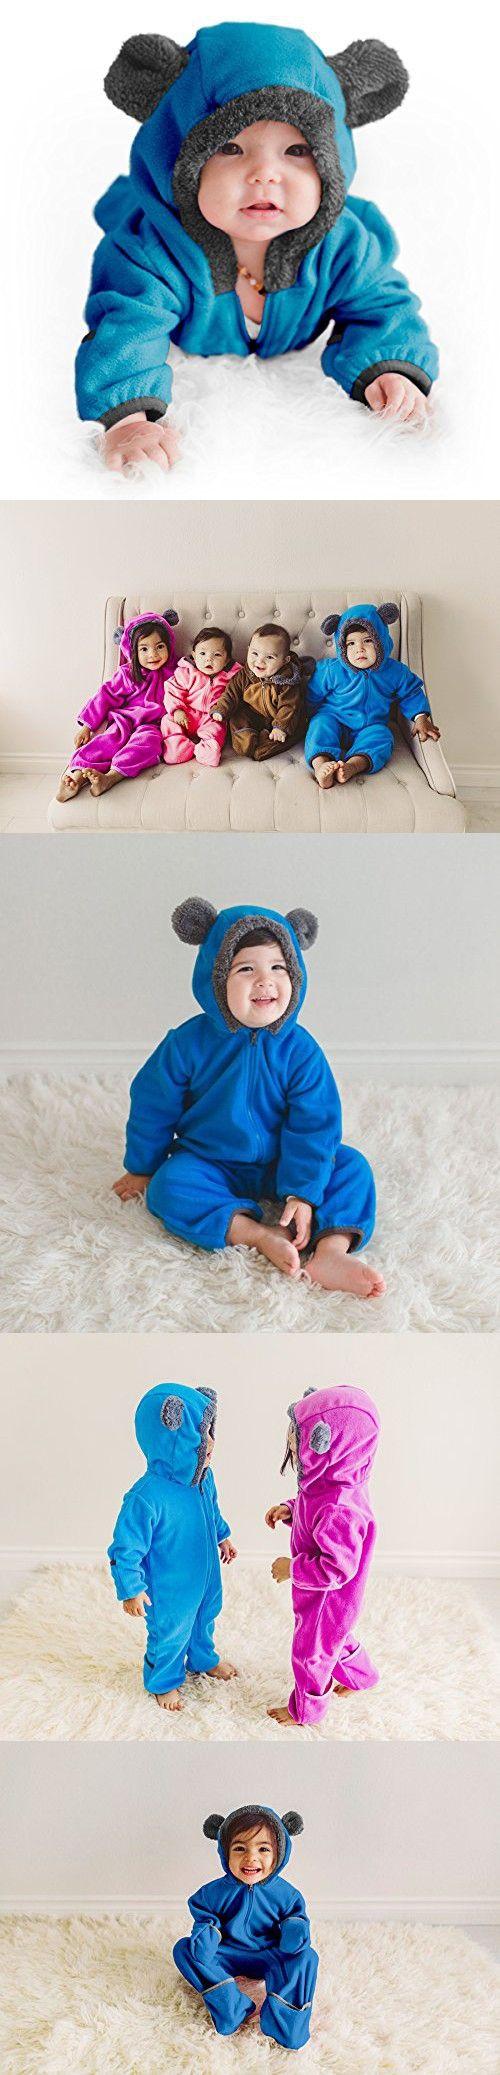 Funzies Baby Bunting Fleece Hooded Romper Bodysuit (3-6 Month, Blue)